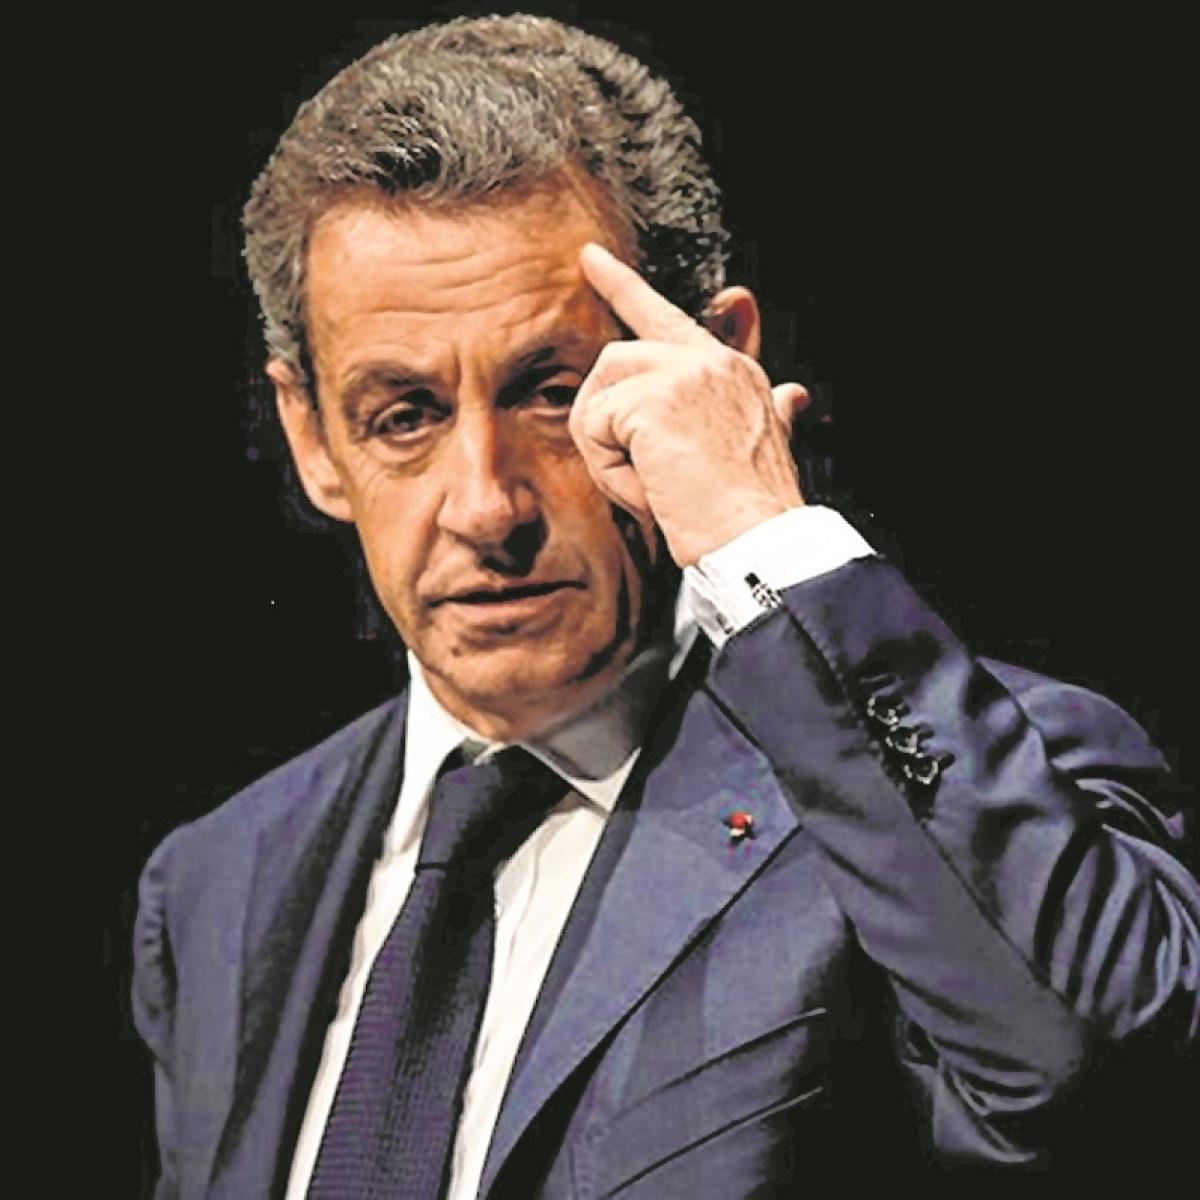 Nicolas Sarkozy sentenced to 1 year in jail for indulging in graft